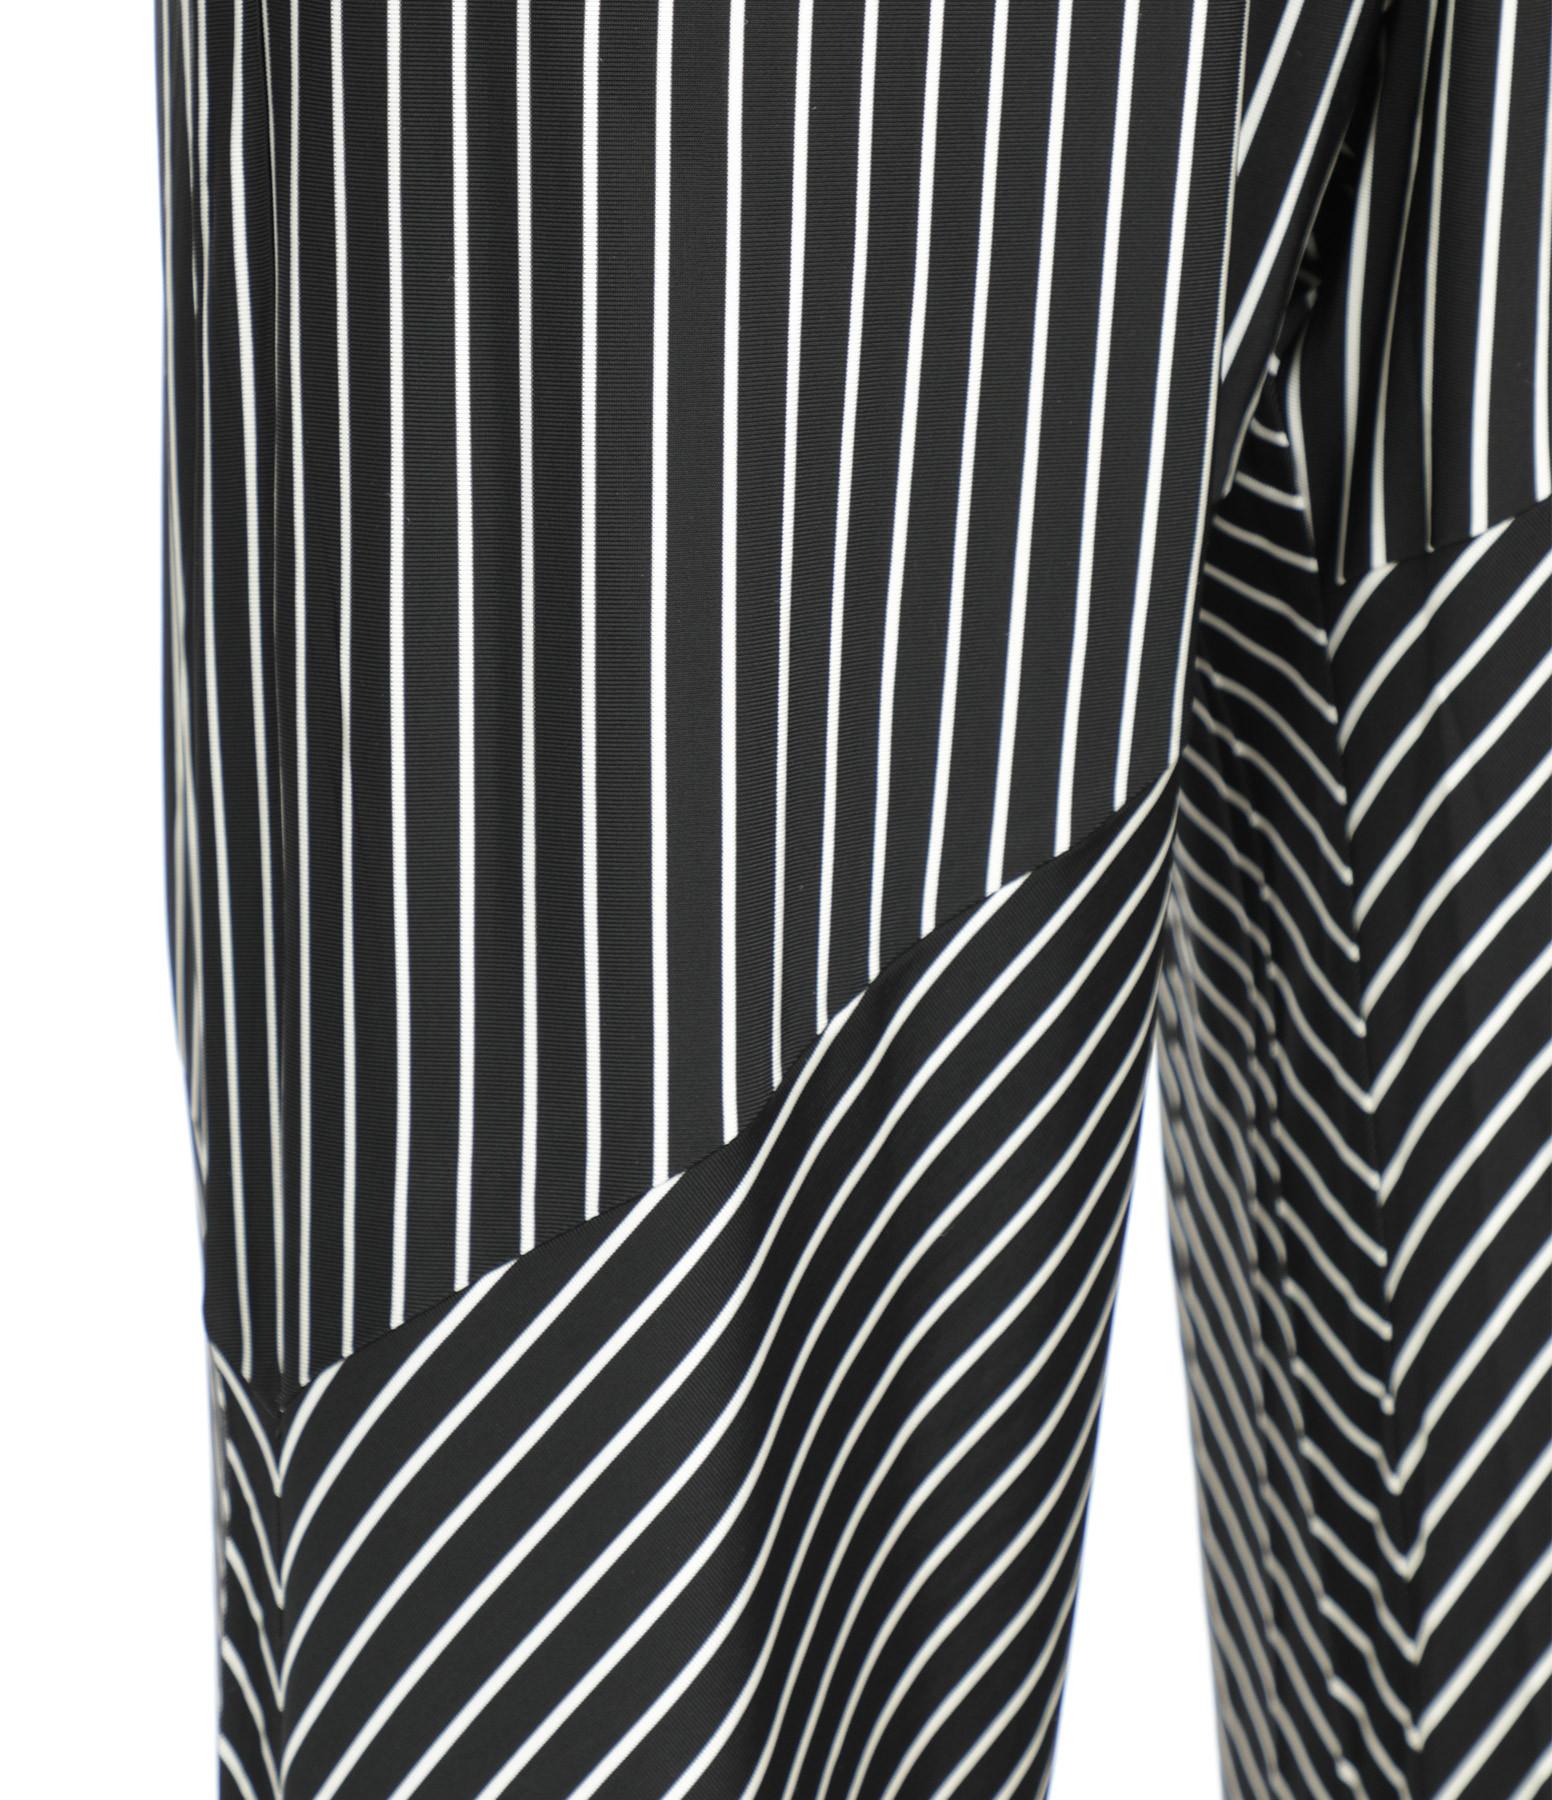 MM6 MAISON MARGIELA - Pantalon Jersey Rayures Noir Blanc